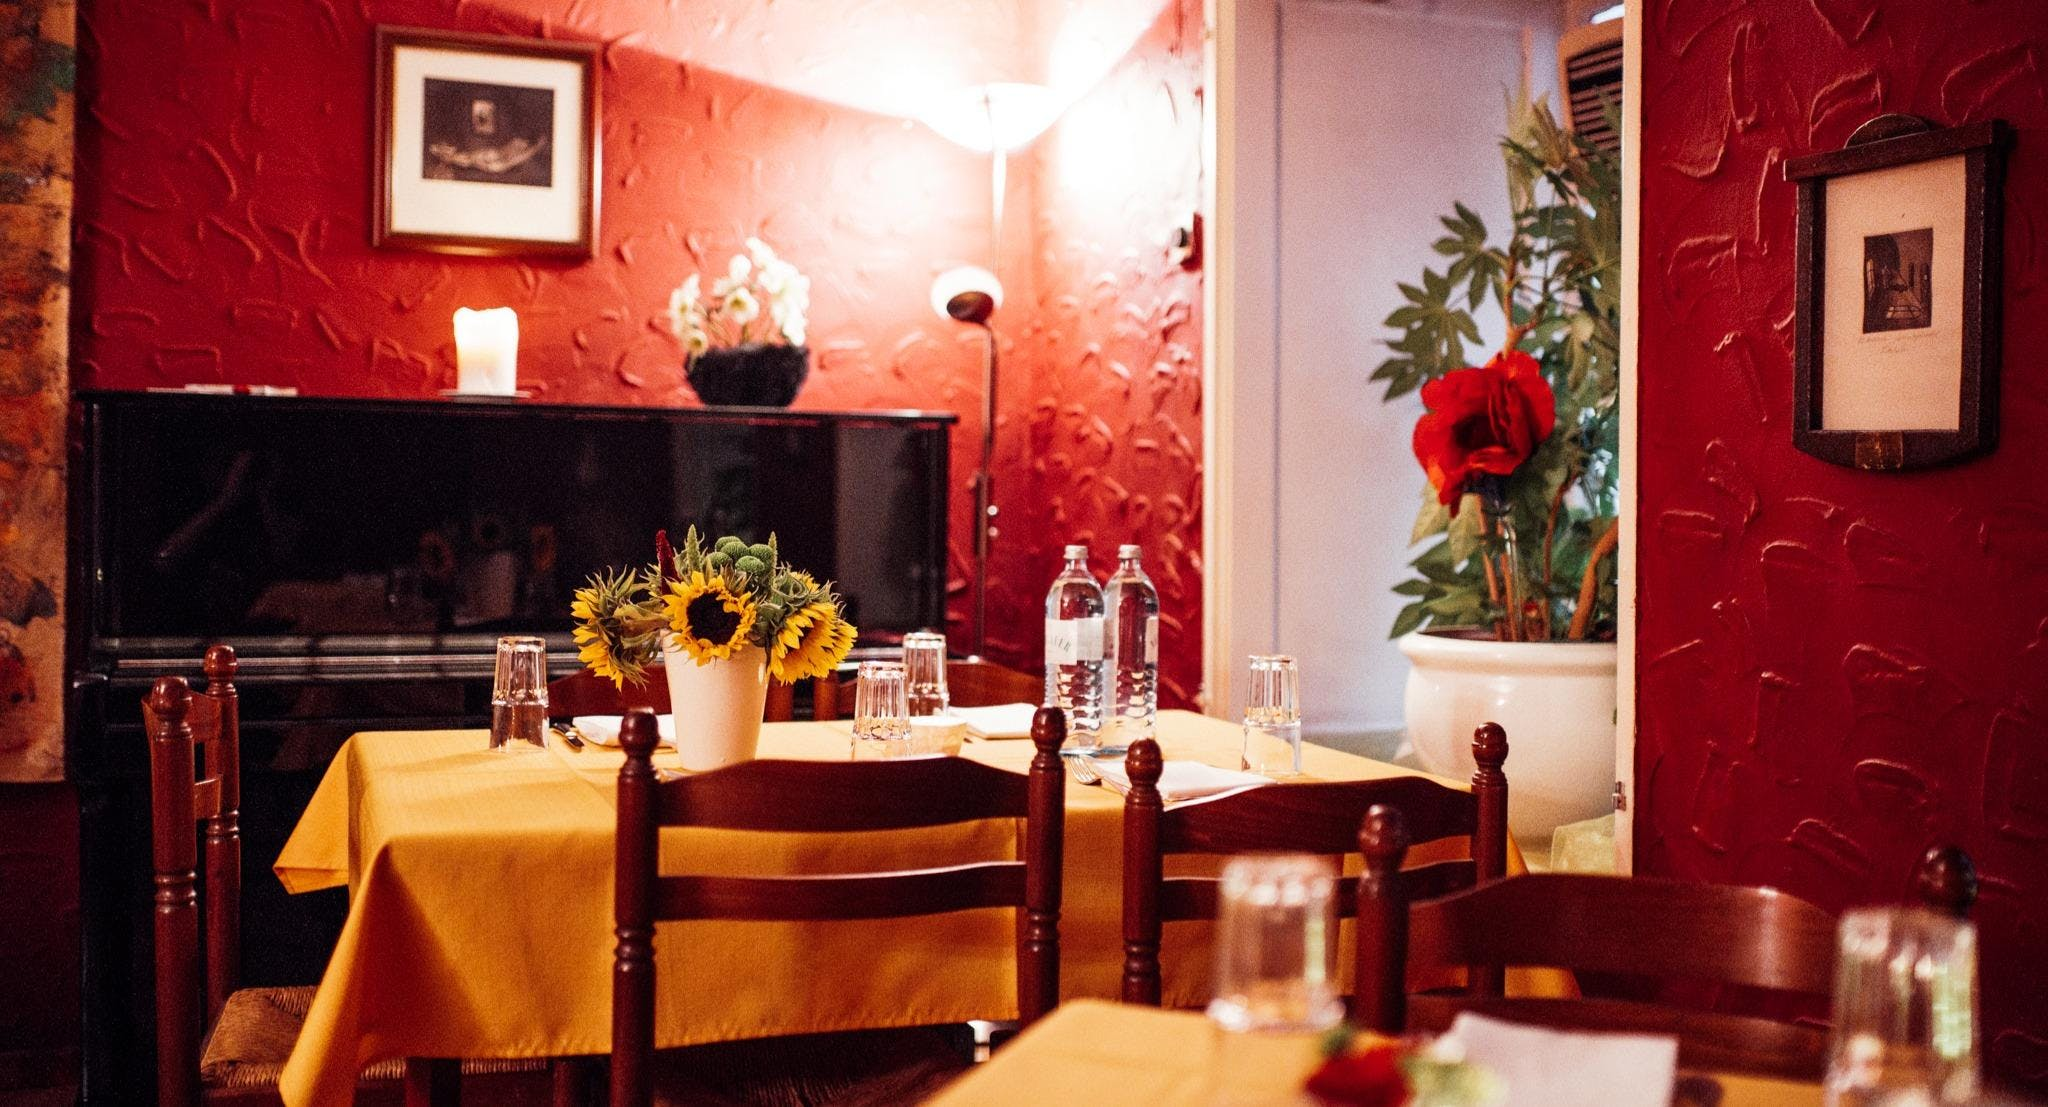 Restaurant 1070 Wien image 2